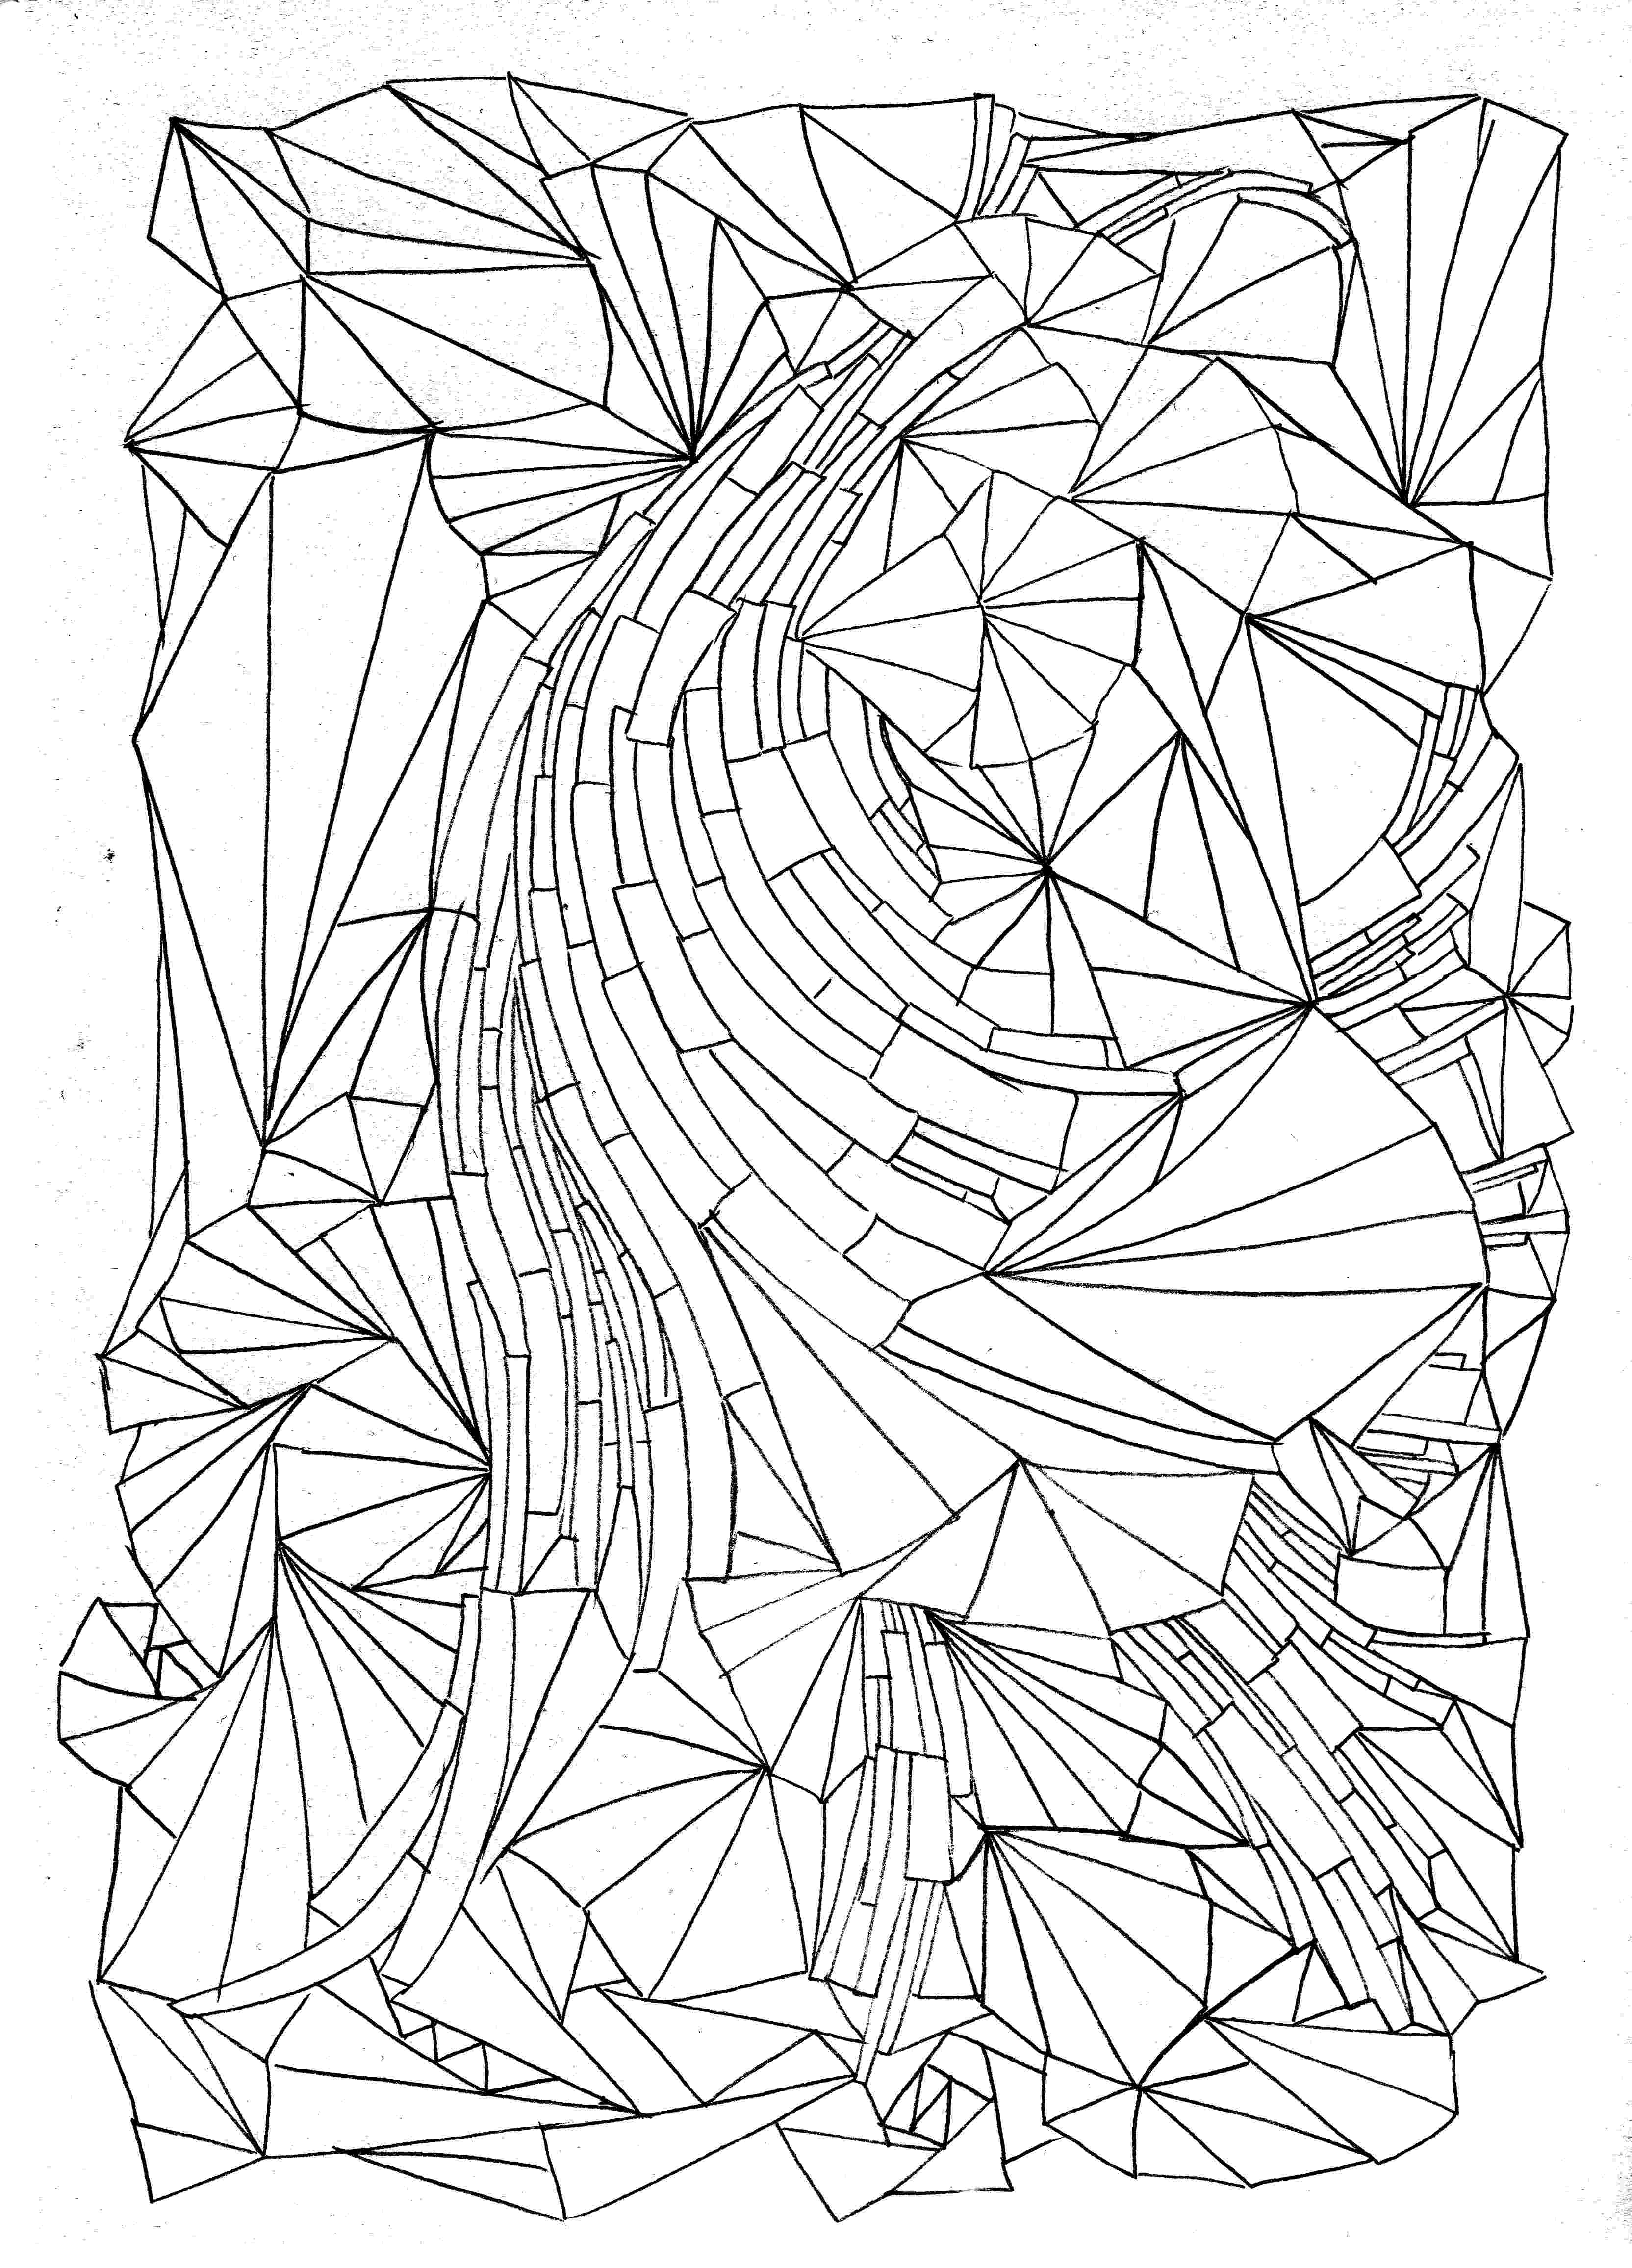 pattern coloring page free printable geometric coloring pages for adults page coloring pattern